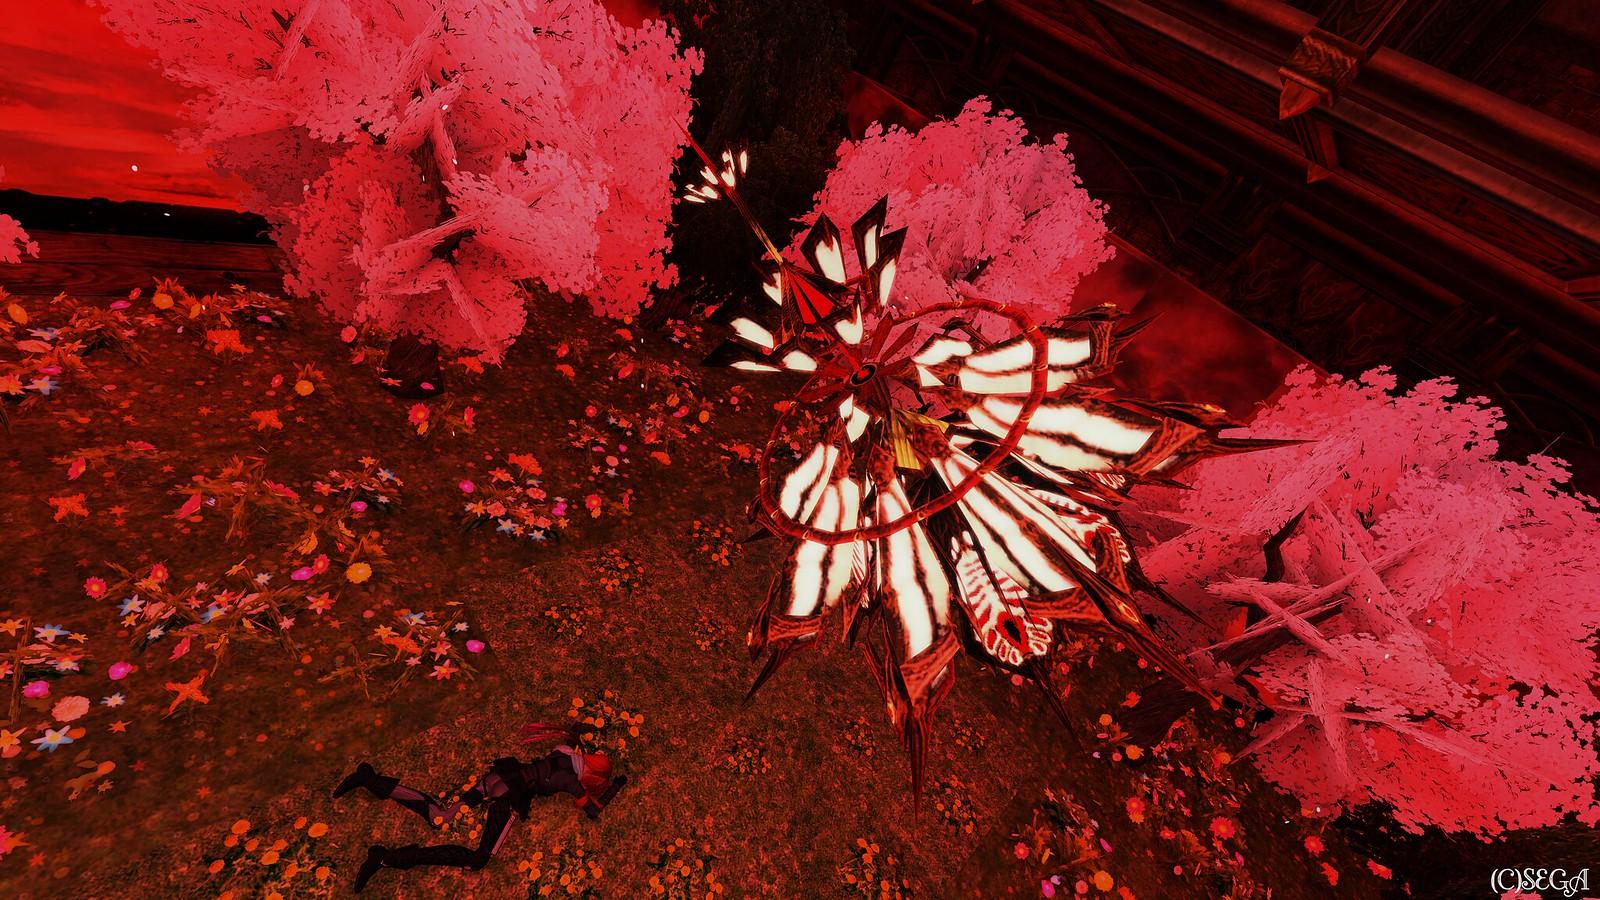 Phantasy Star Online 2 Screenshot 2020.05.16 - 23.18.09.36